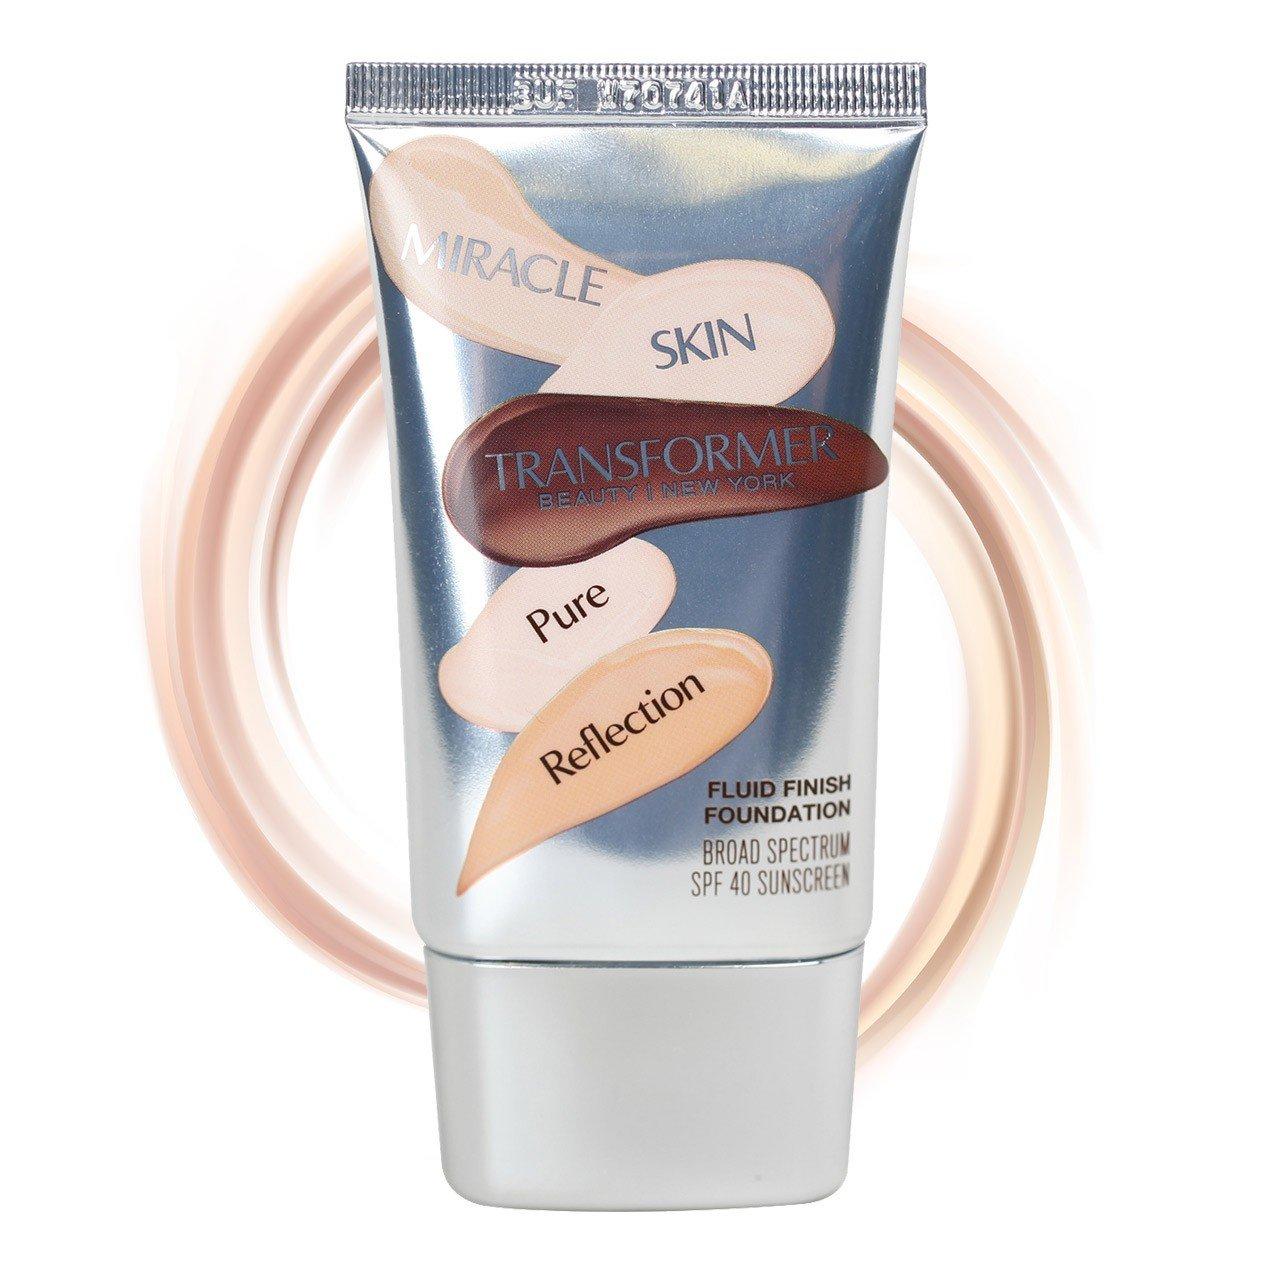 Amazon.com : Miracle Skin Transformer SPF40 Pure Reflection Fluid ...